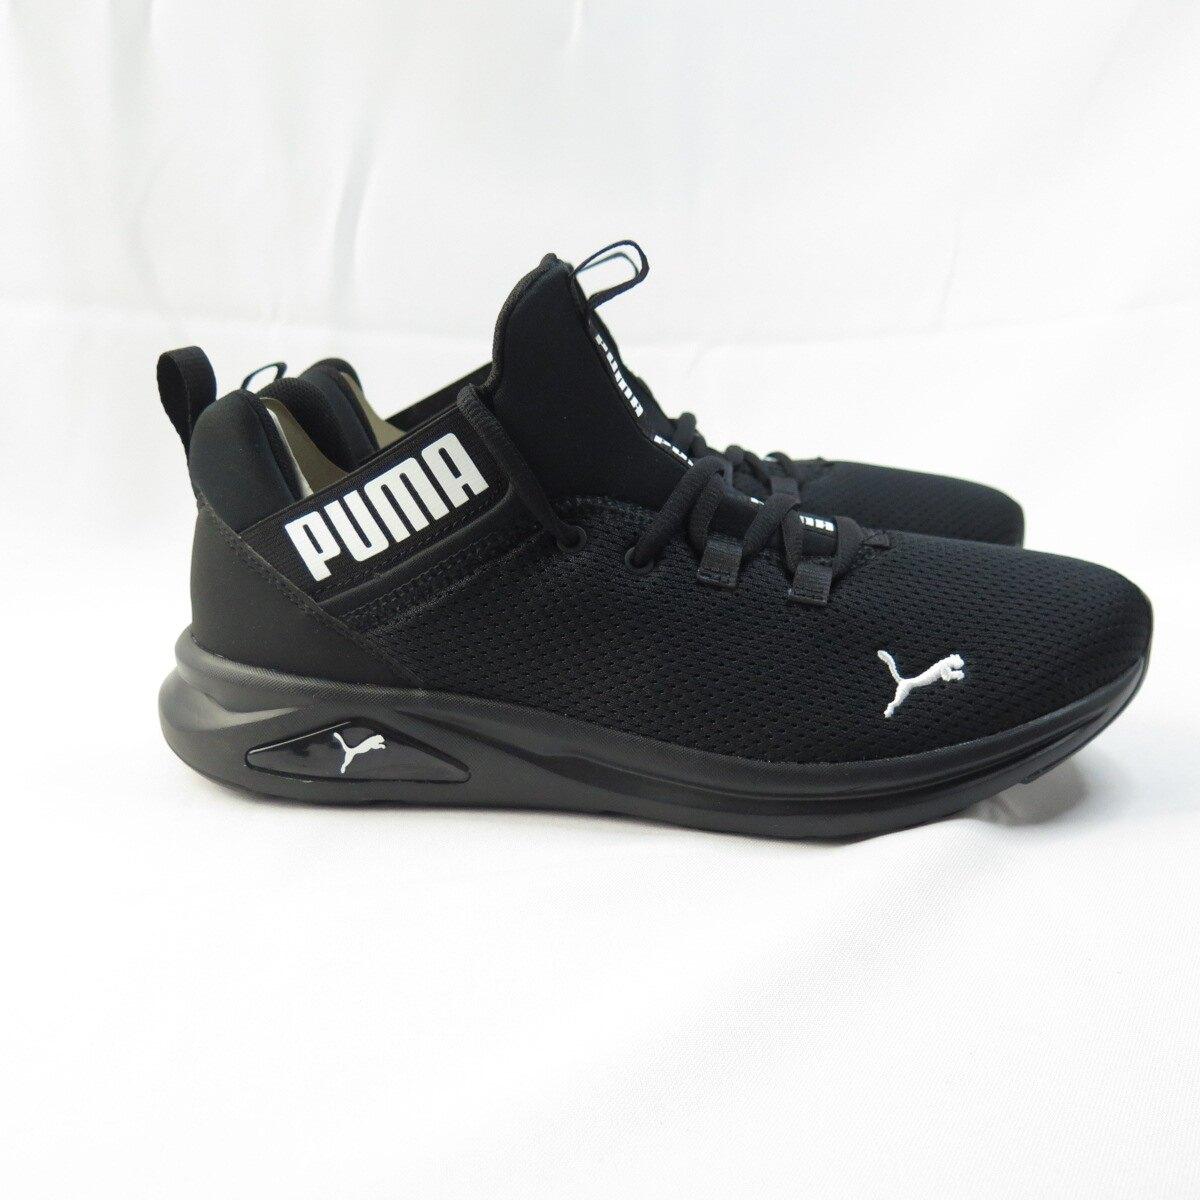 PUMA ENZO 2 UNCAGED 男款 休閒鞋 19510501 黑【iSport愛運動】